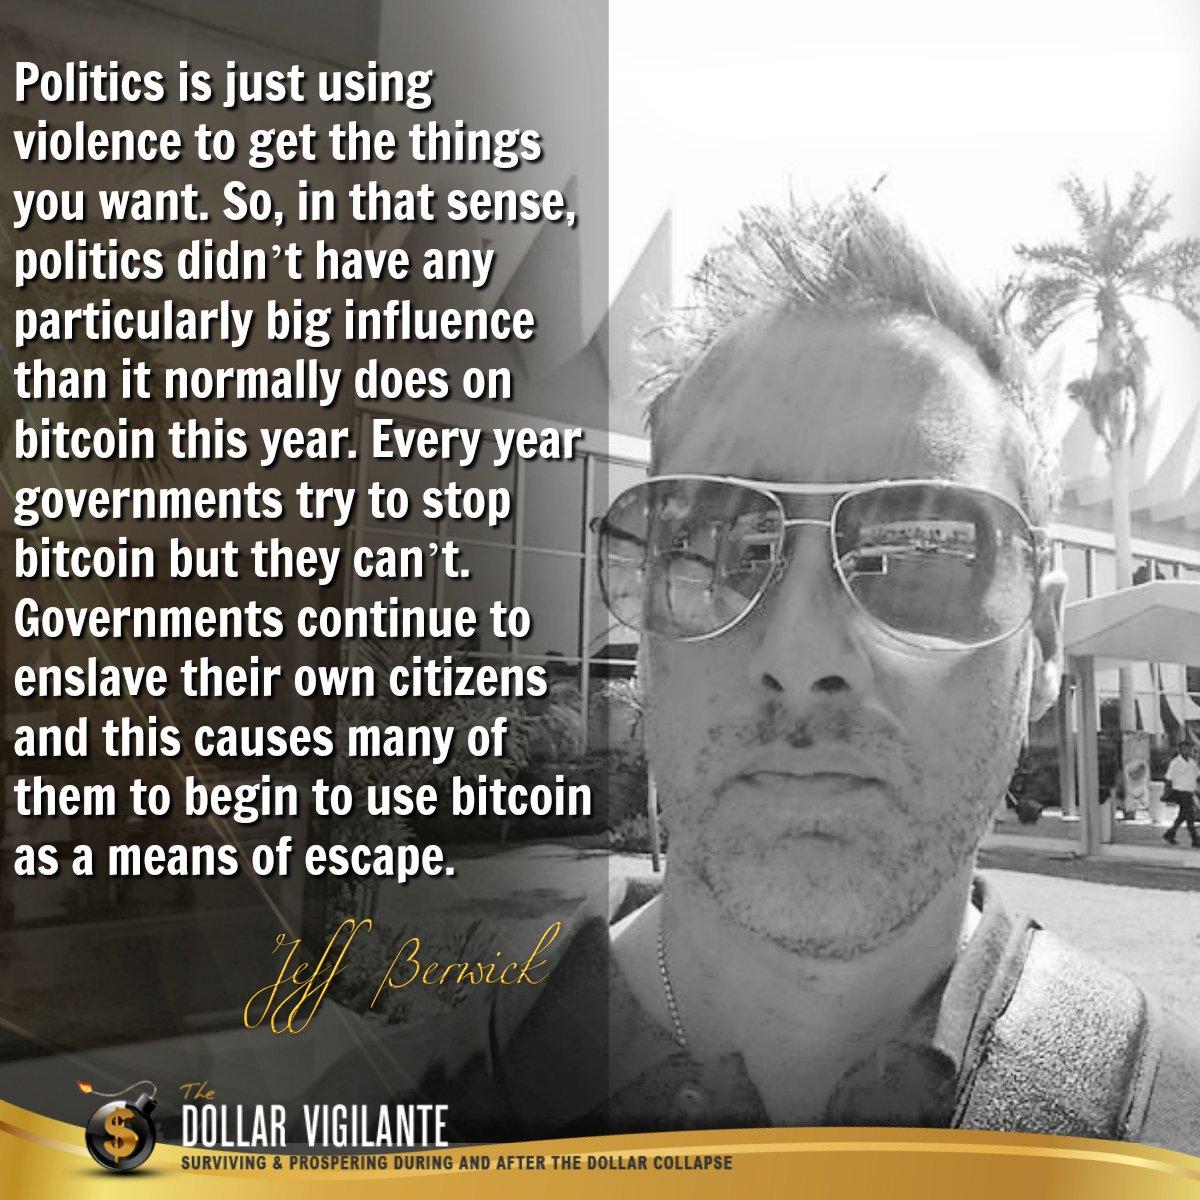 The Dollar Vigilante on Twitter: